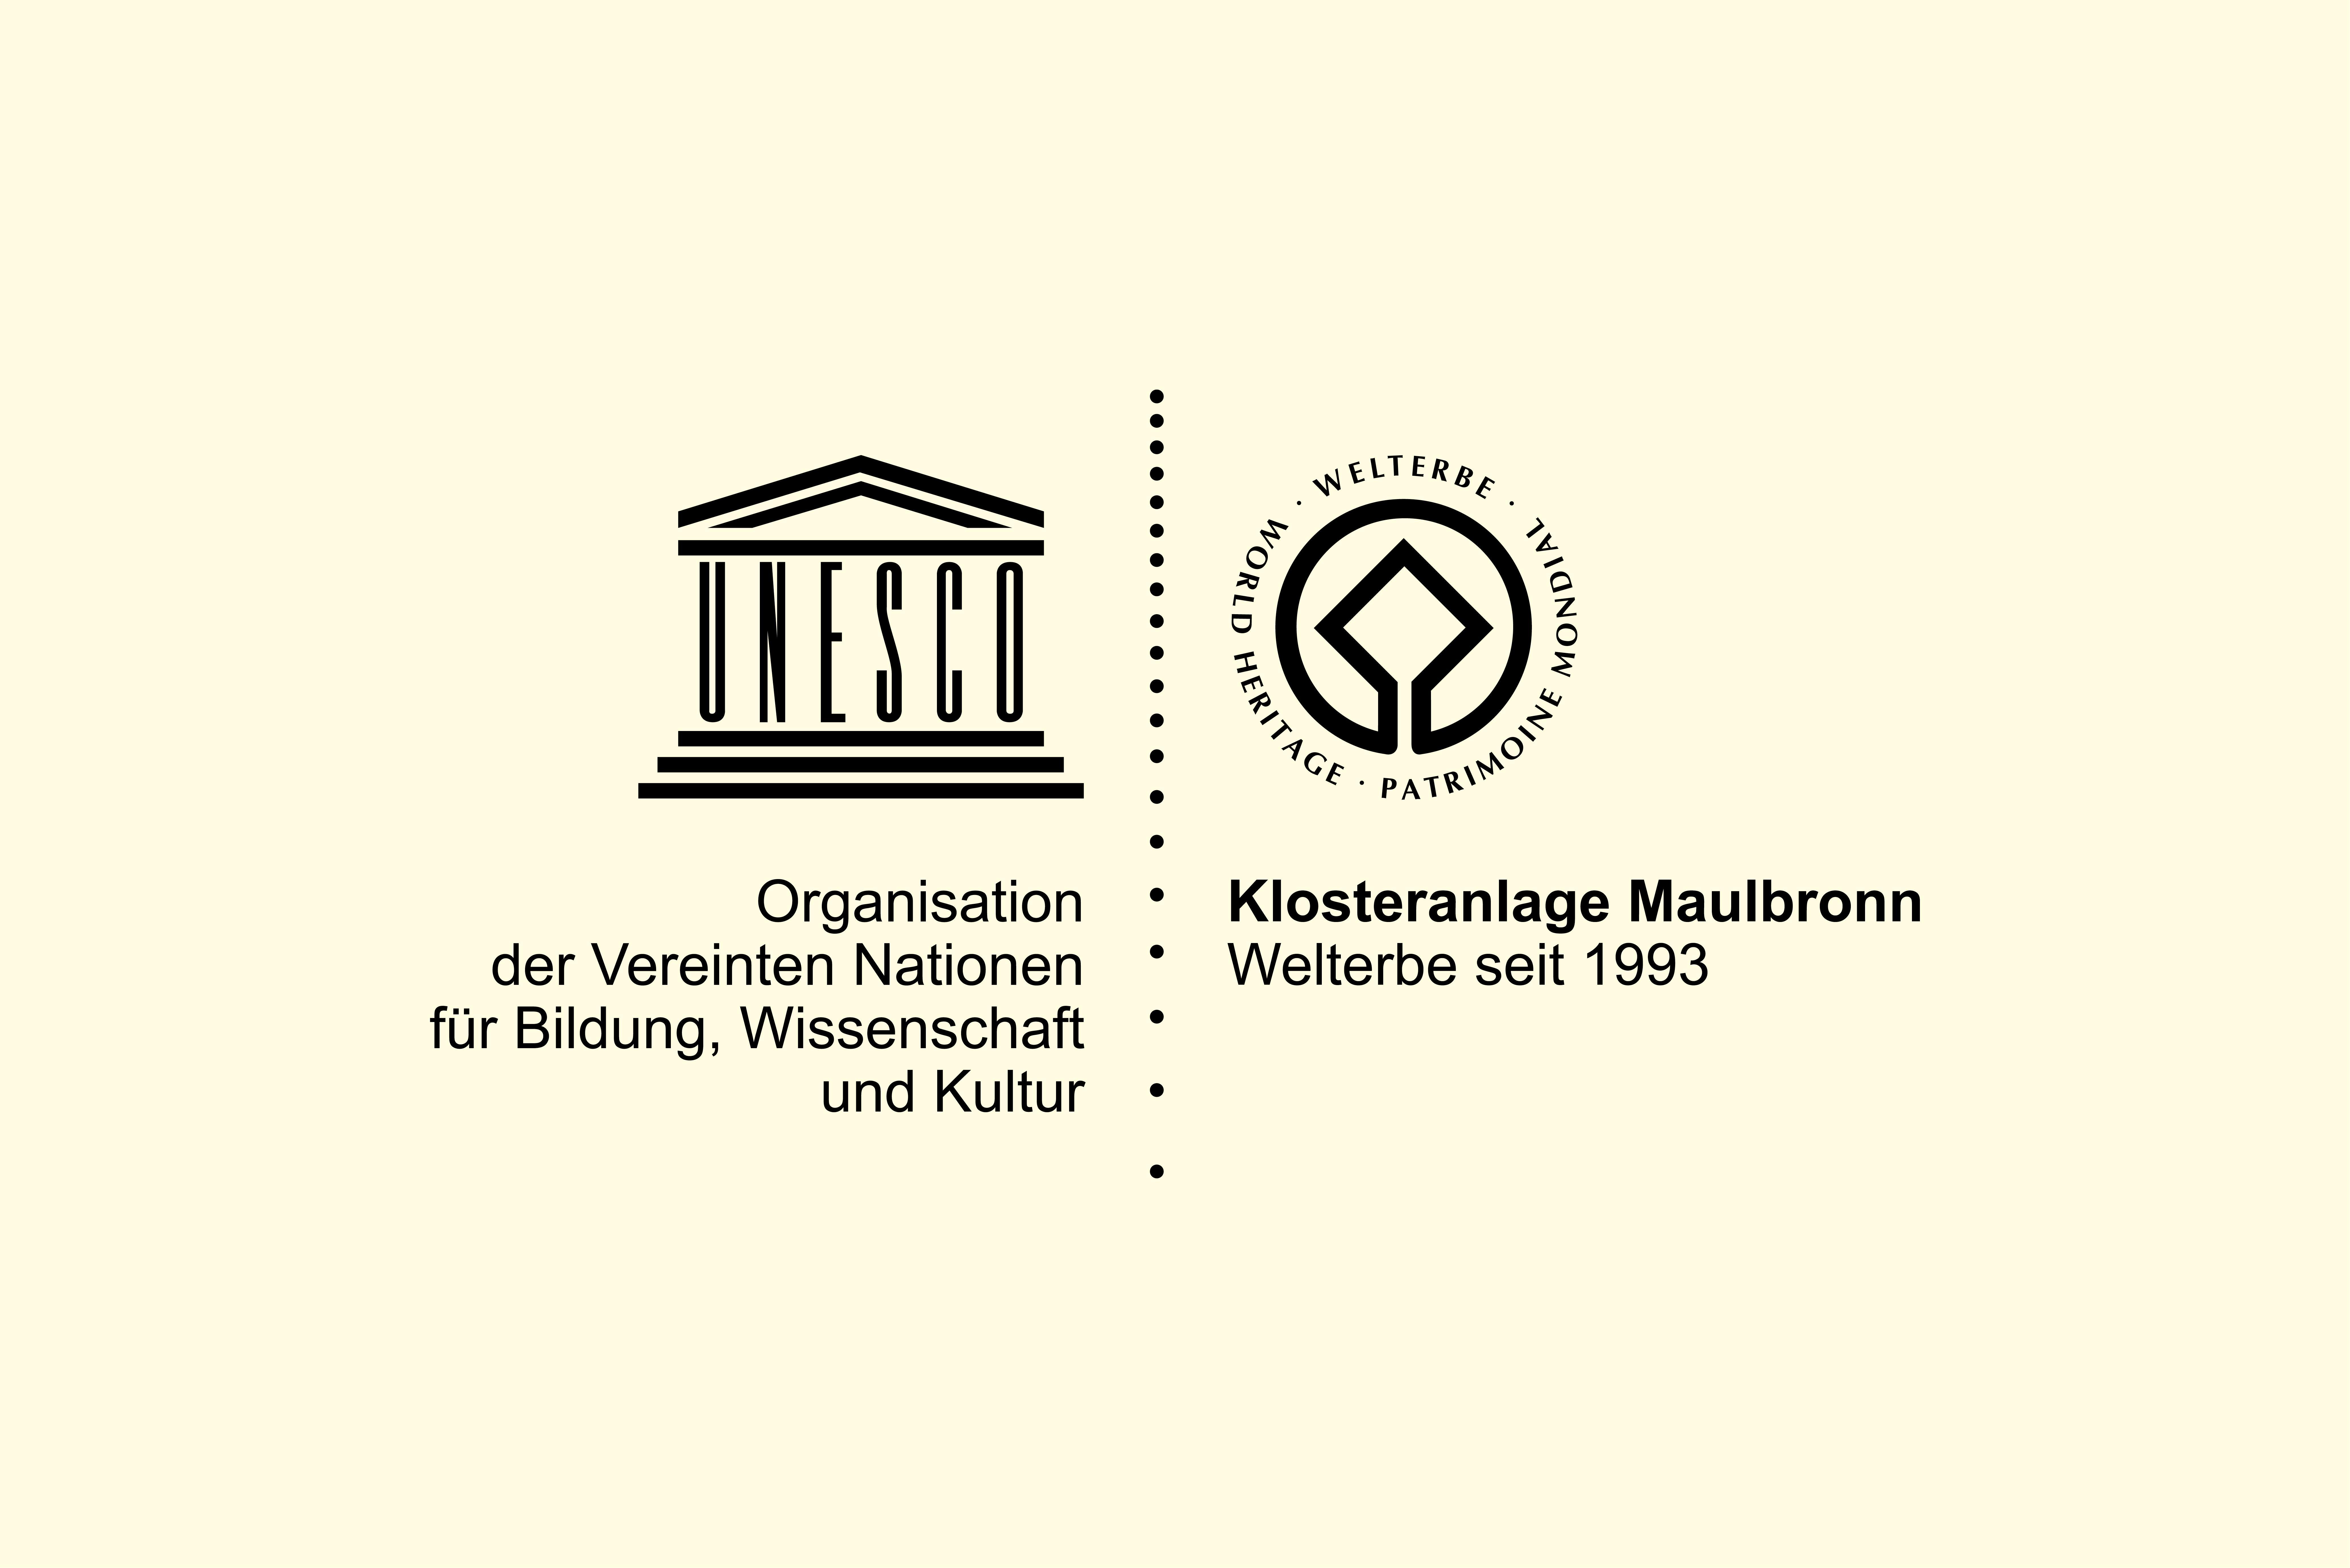 Logo Unesco; Illustration: Deutsche UNESCO-Kommision e.V.